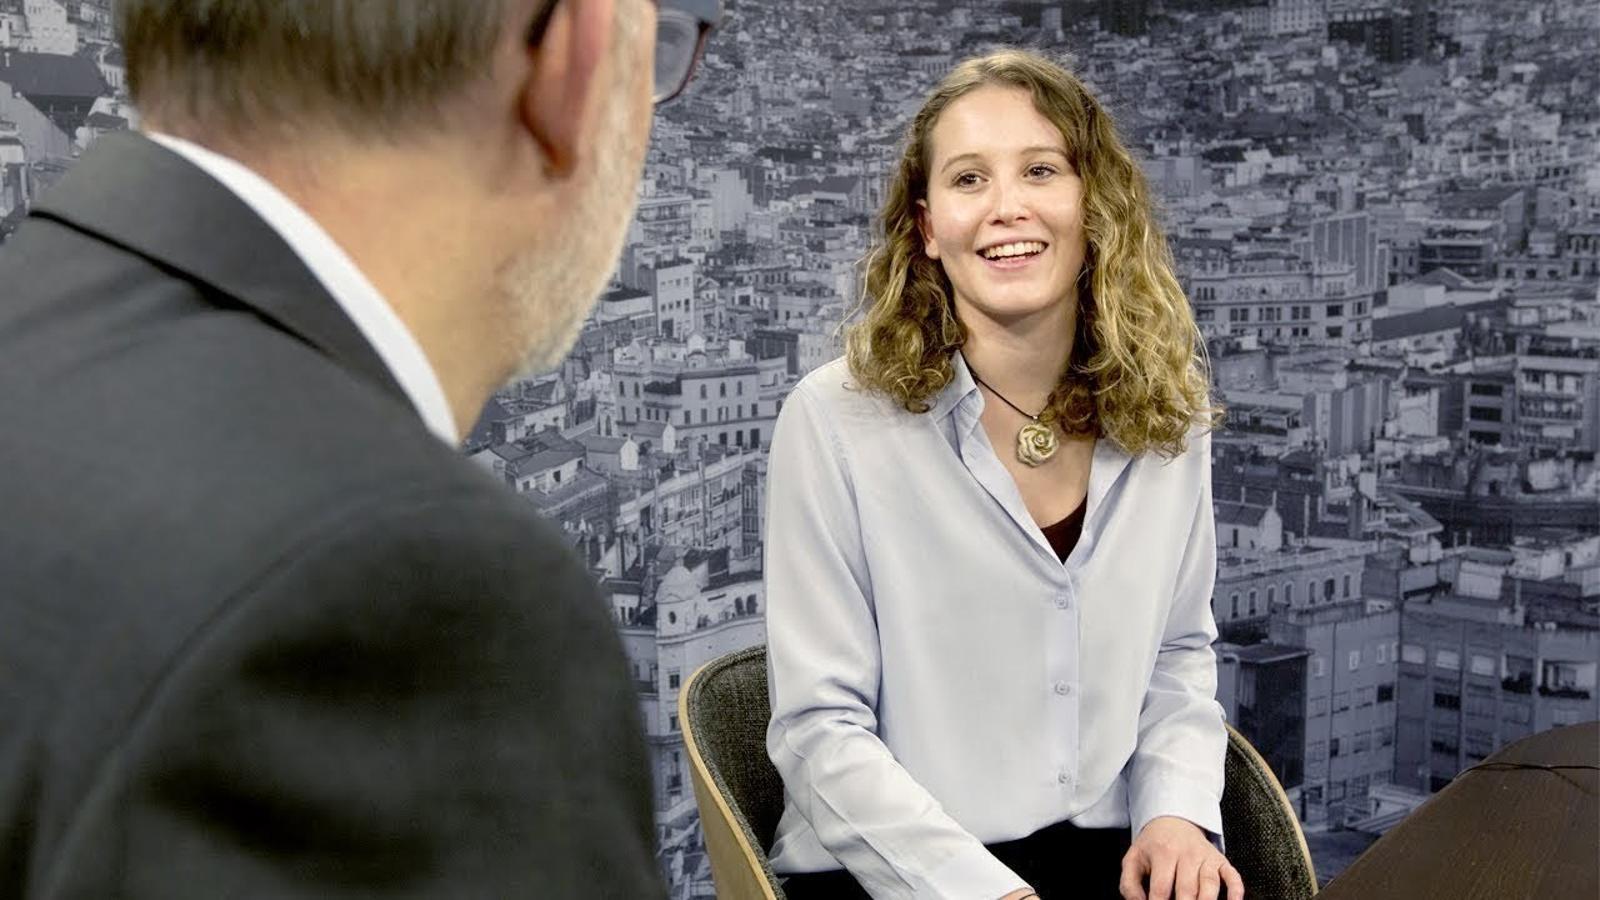 Entrevista d'Antoni Bassas a Giulia Duch